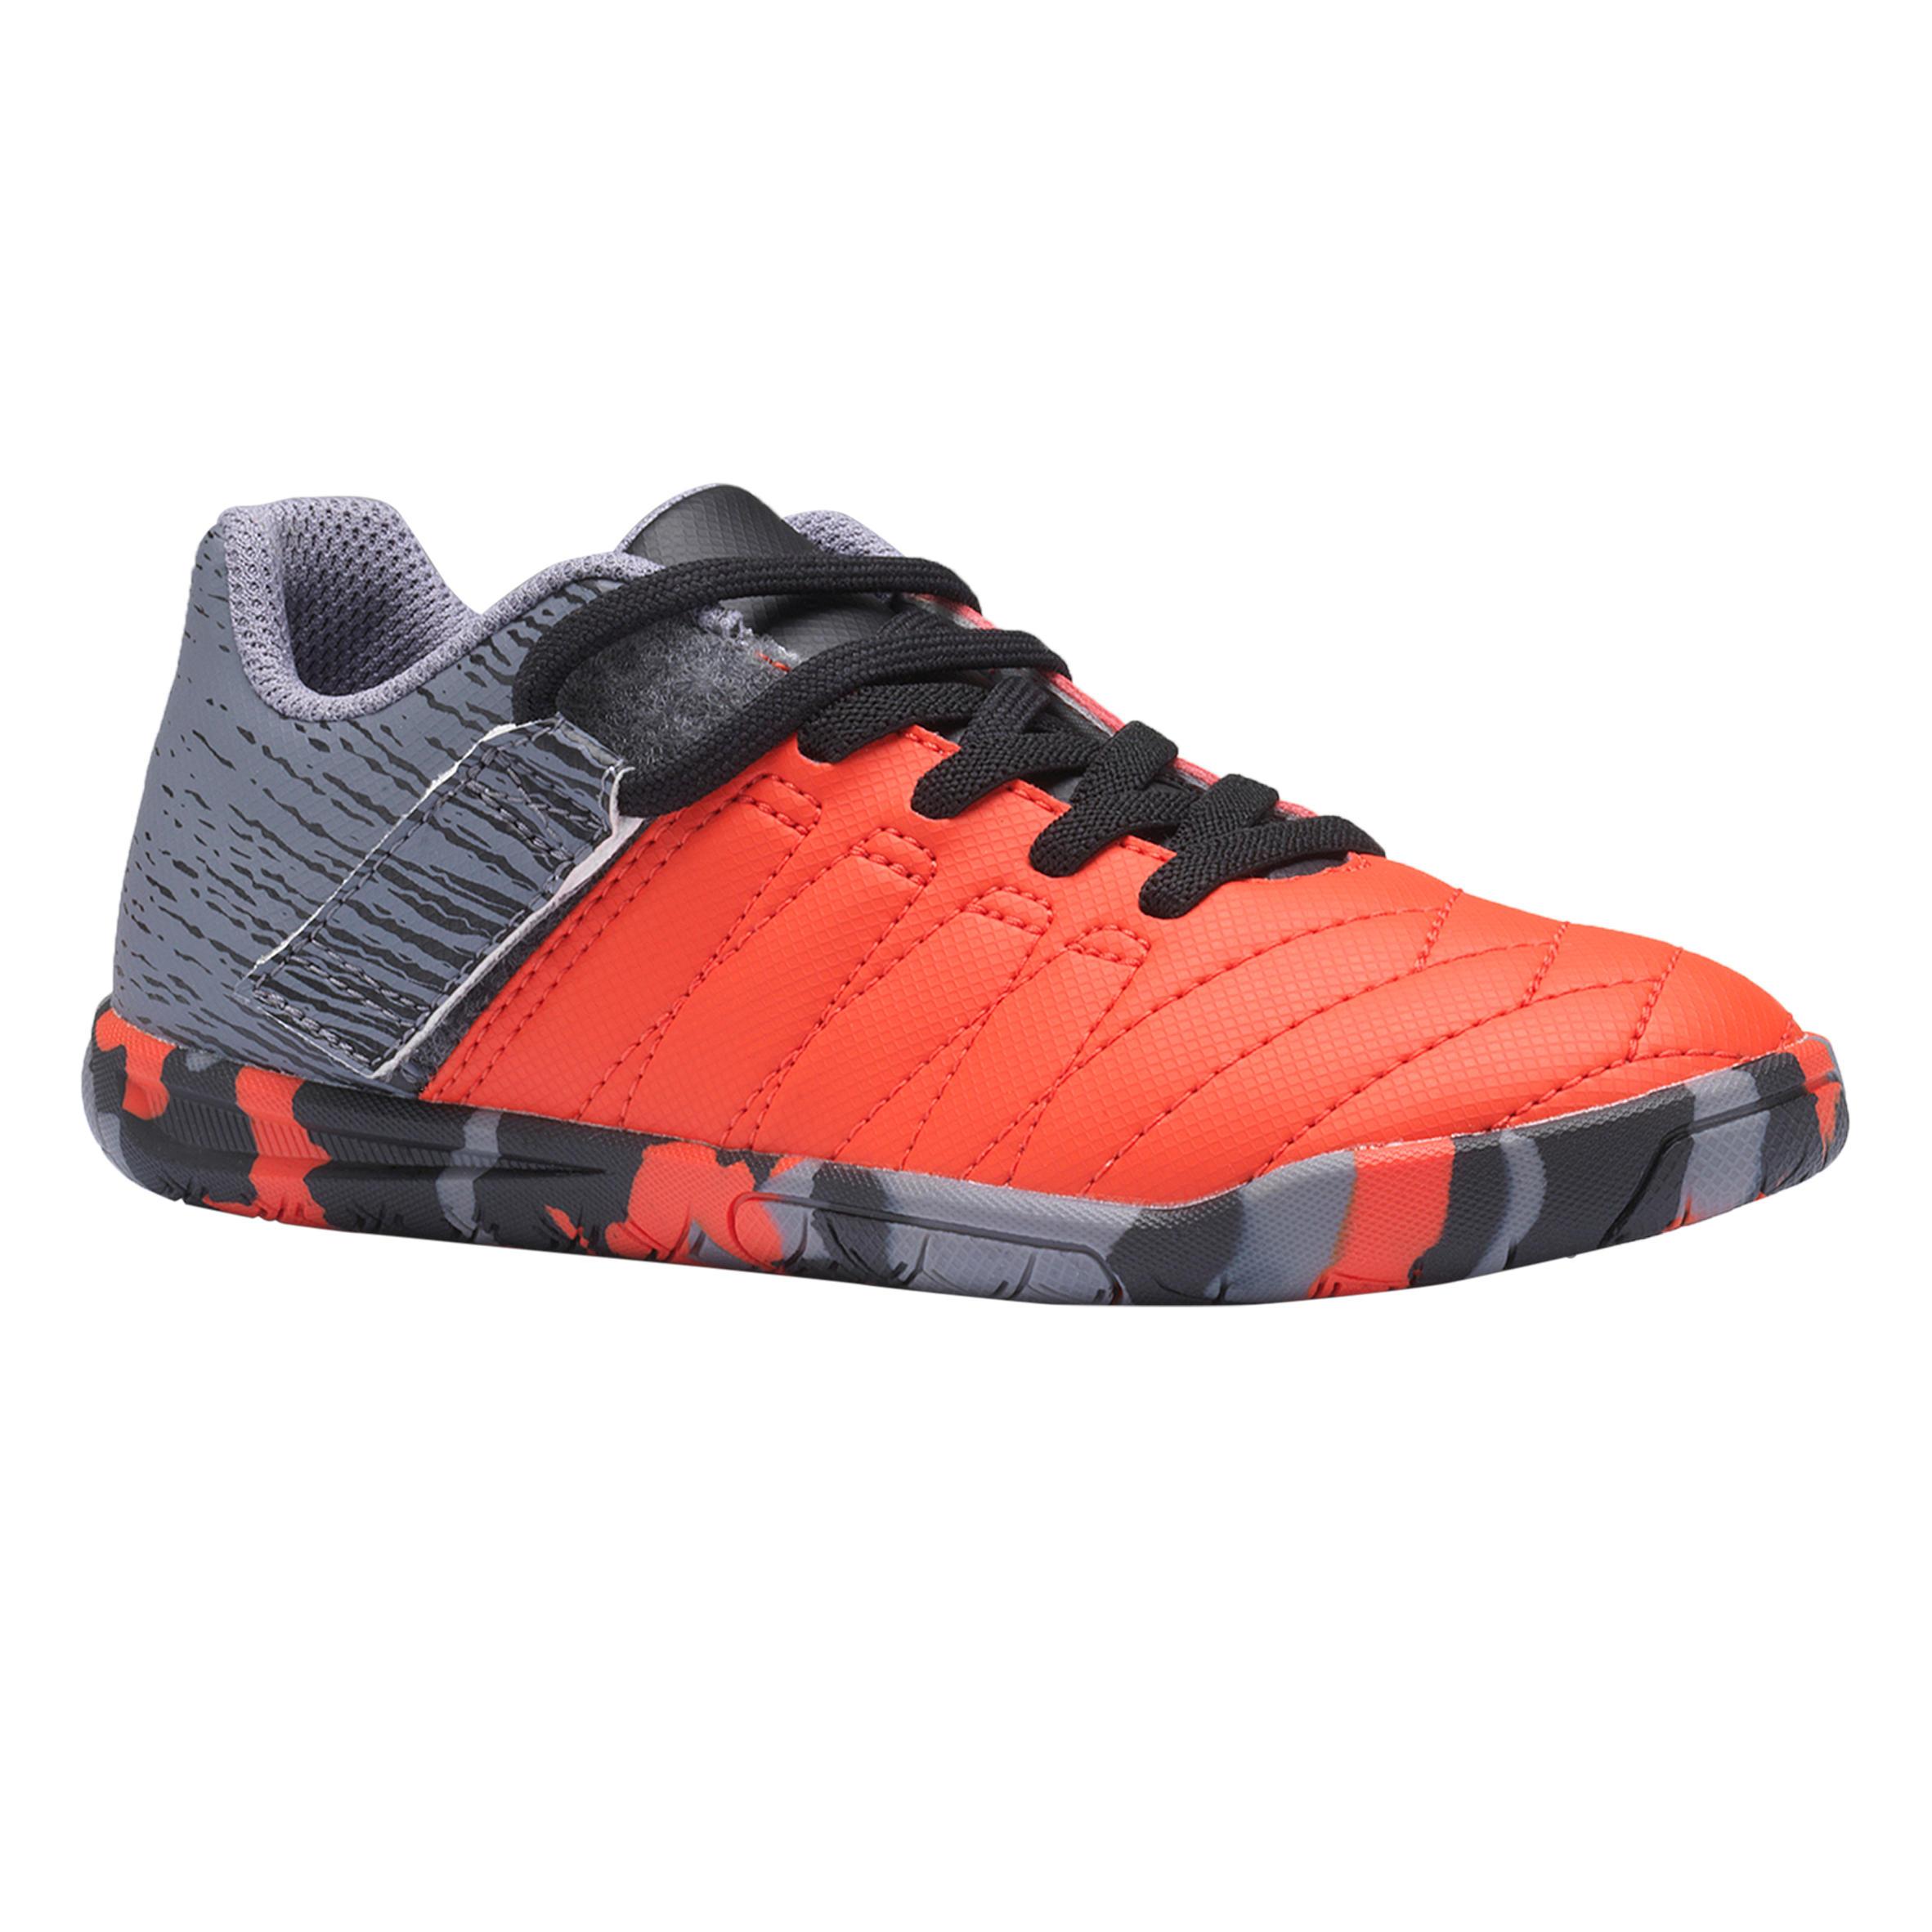 elegant shoes look for nice cheap Fussballschuhe | Sport günstig kaufen | DECATHLON